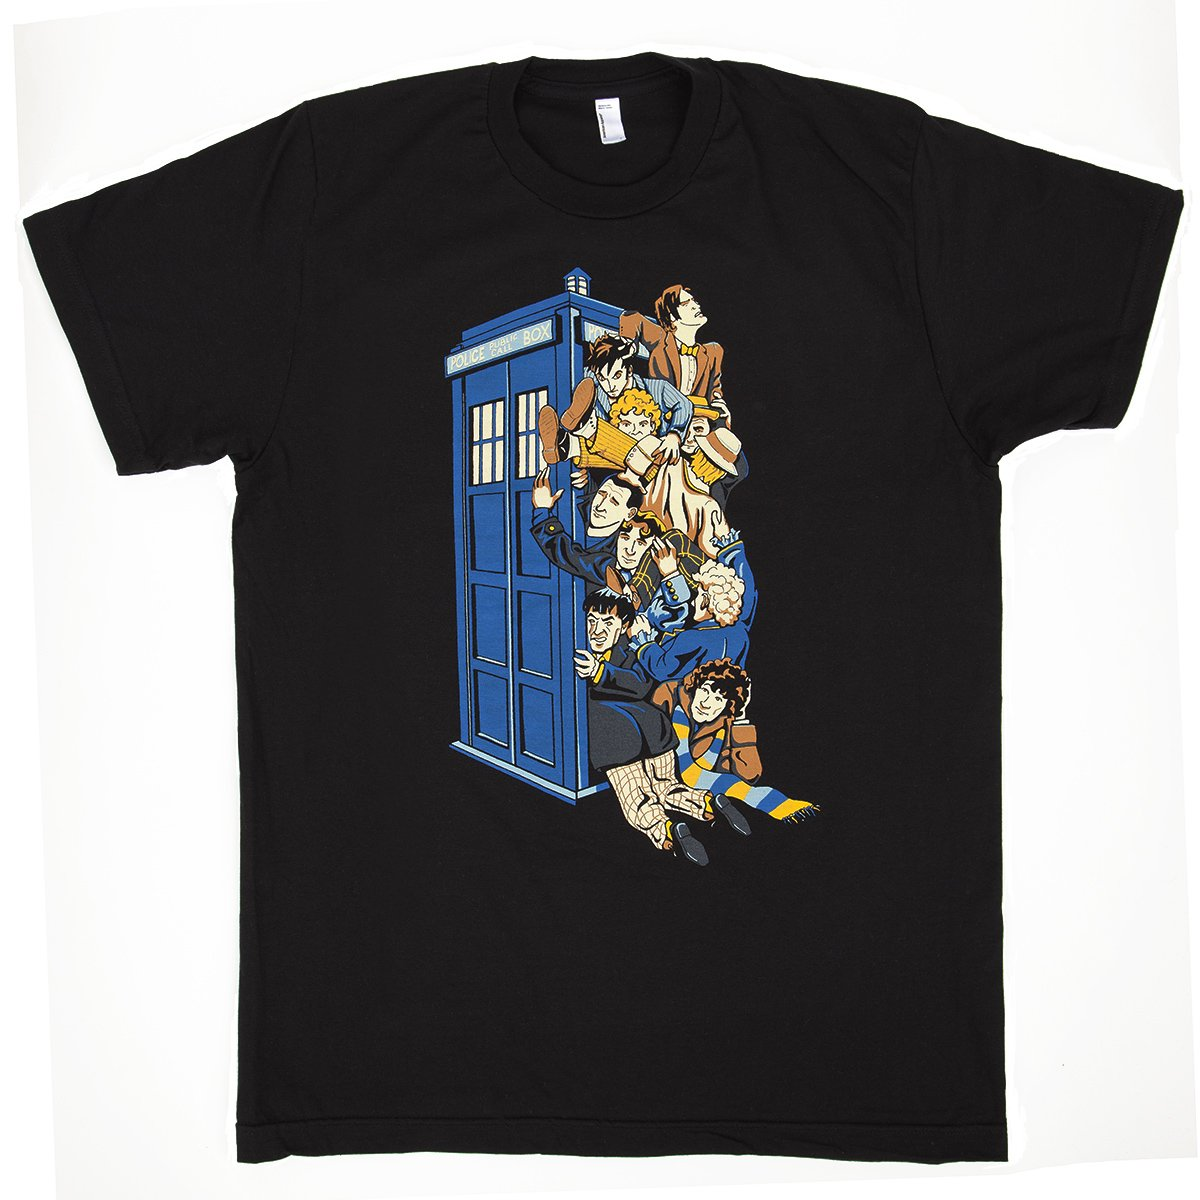 Ian Leino Design - Doctor Who 'Who's Who' Short Sleeve Shirt